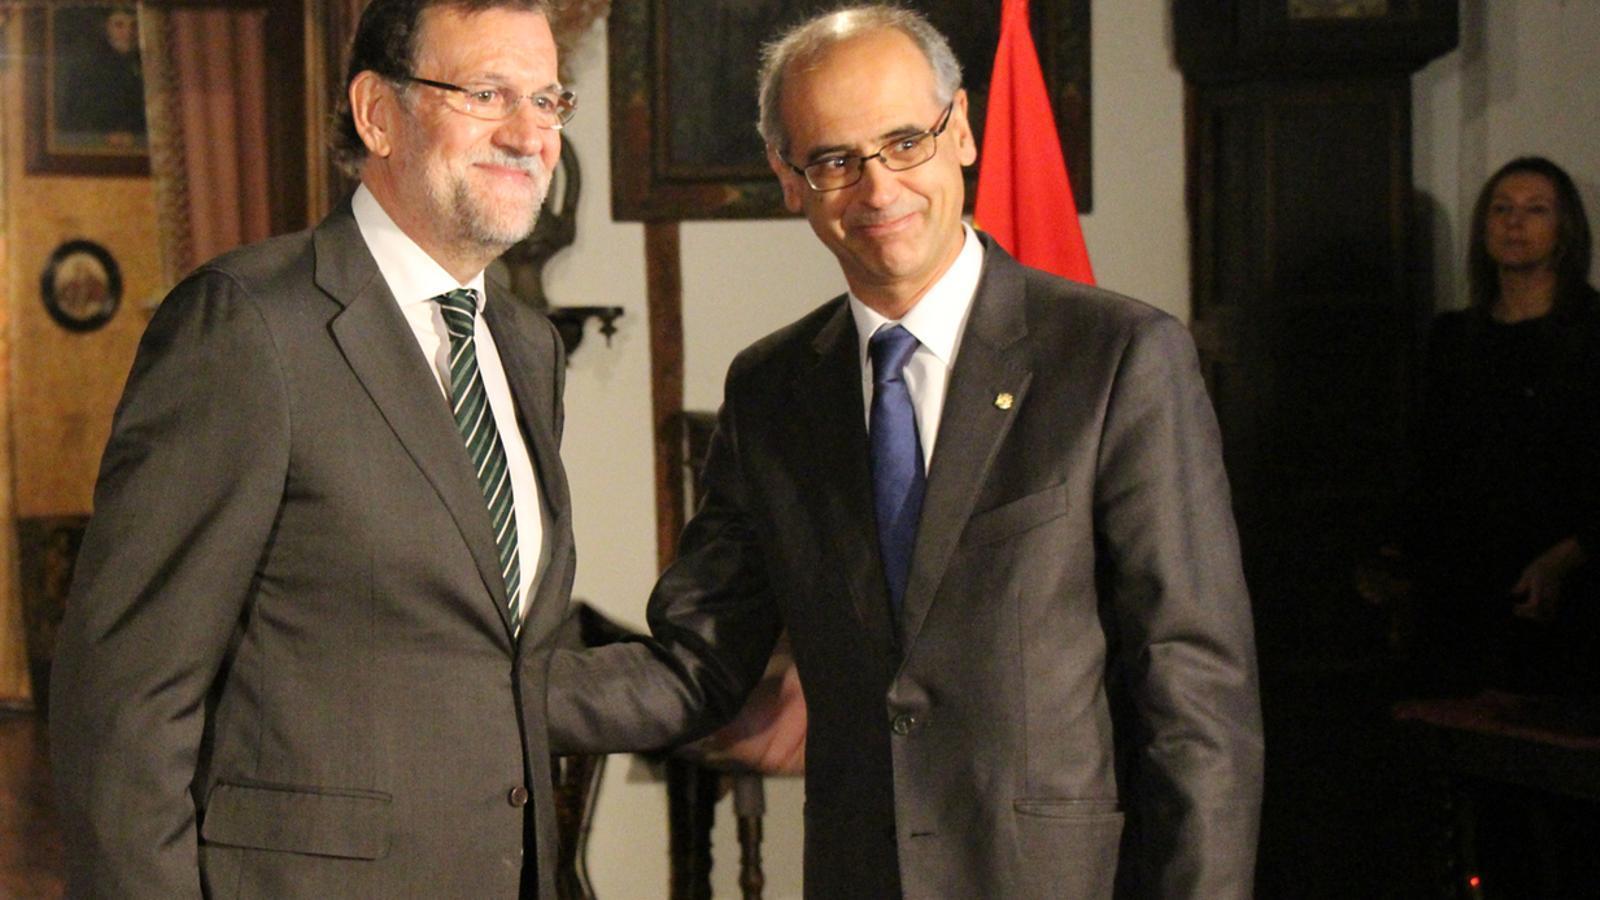 Mariano Rajoy i Toni Martí durant la seva visita a Andorra / ANA